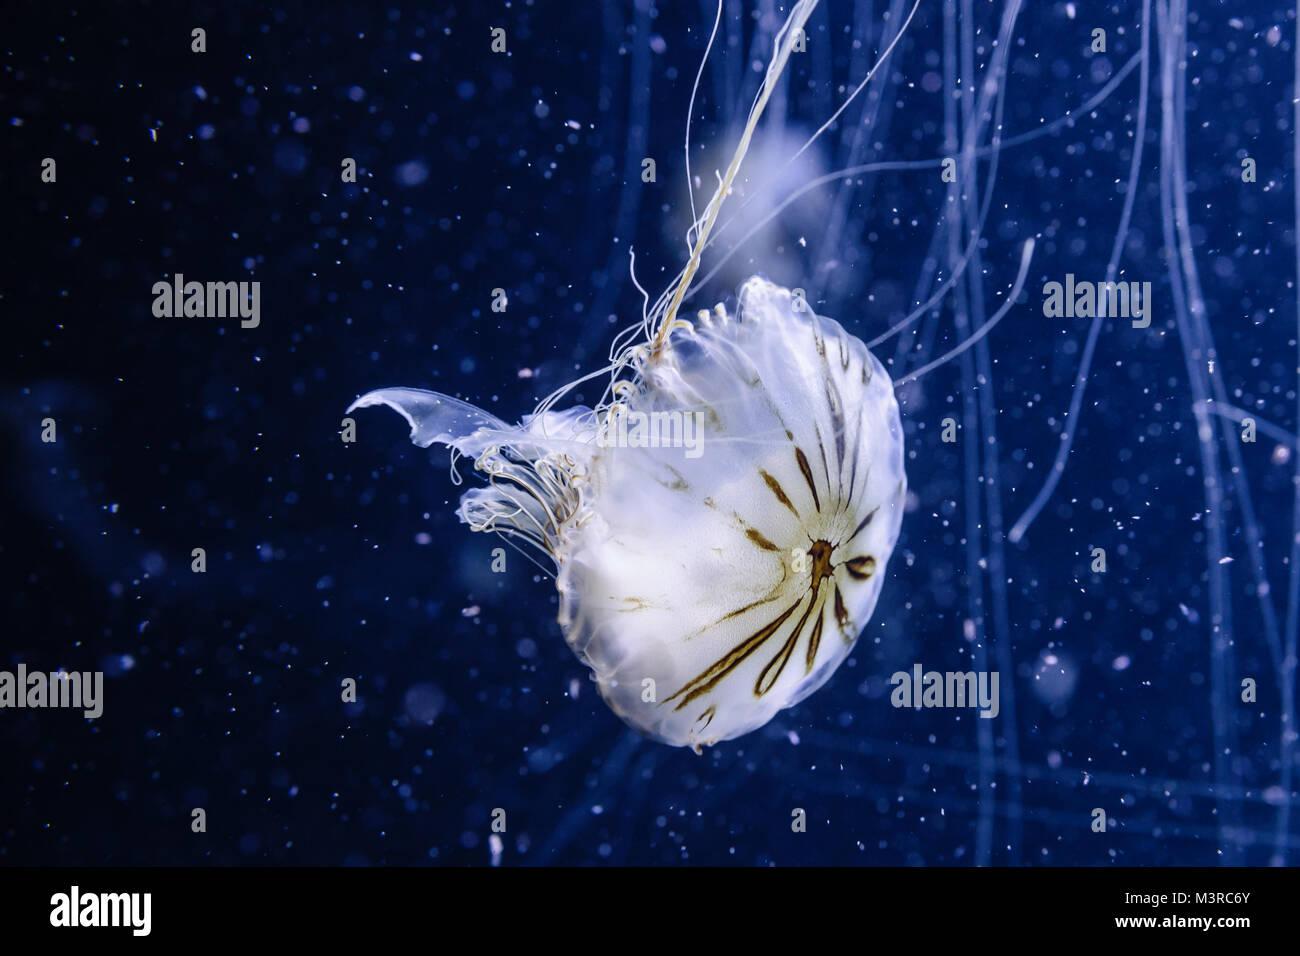 Kompassquallen, Chrysaora Hysoscella, Medusa de Compases Aquarium-Foto Stock Photo